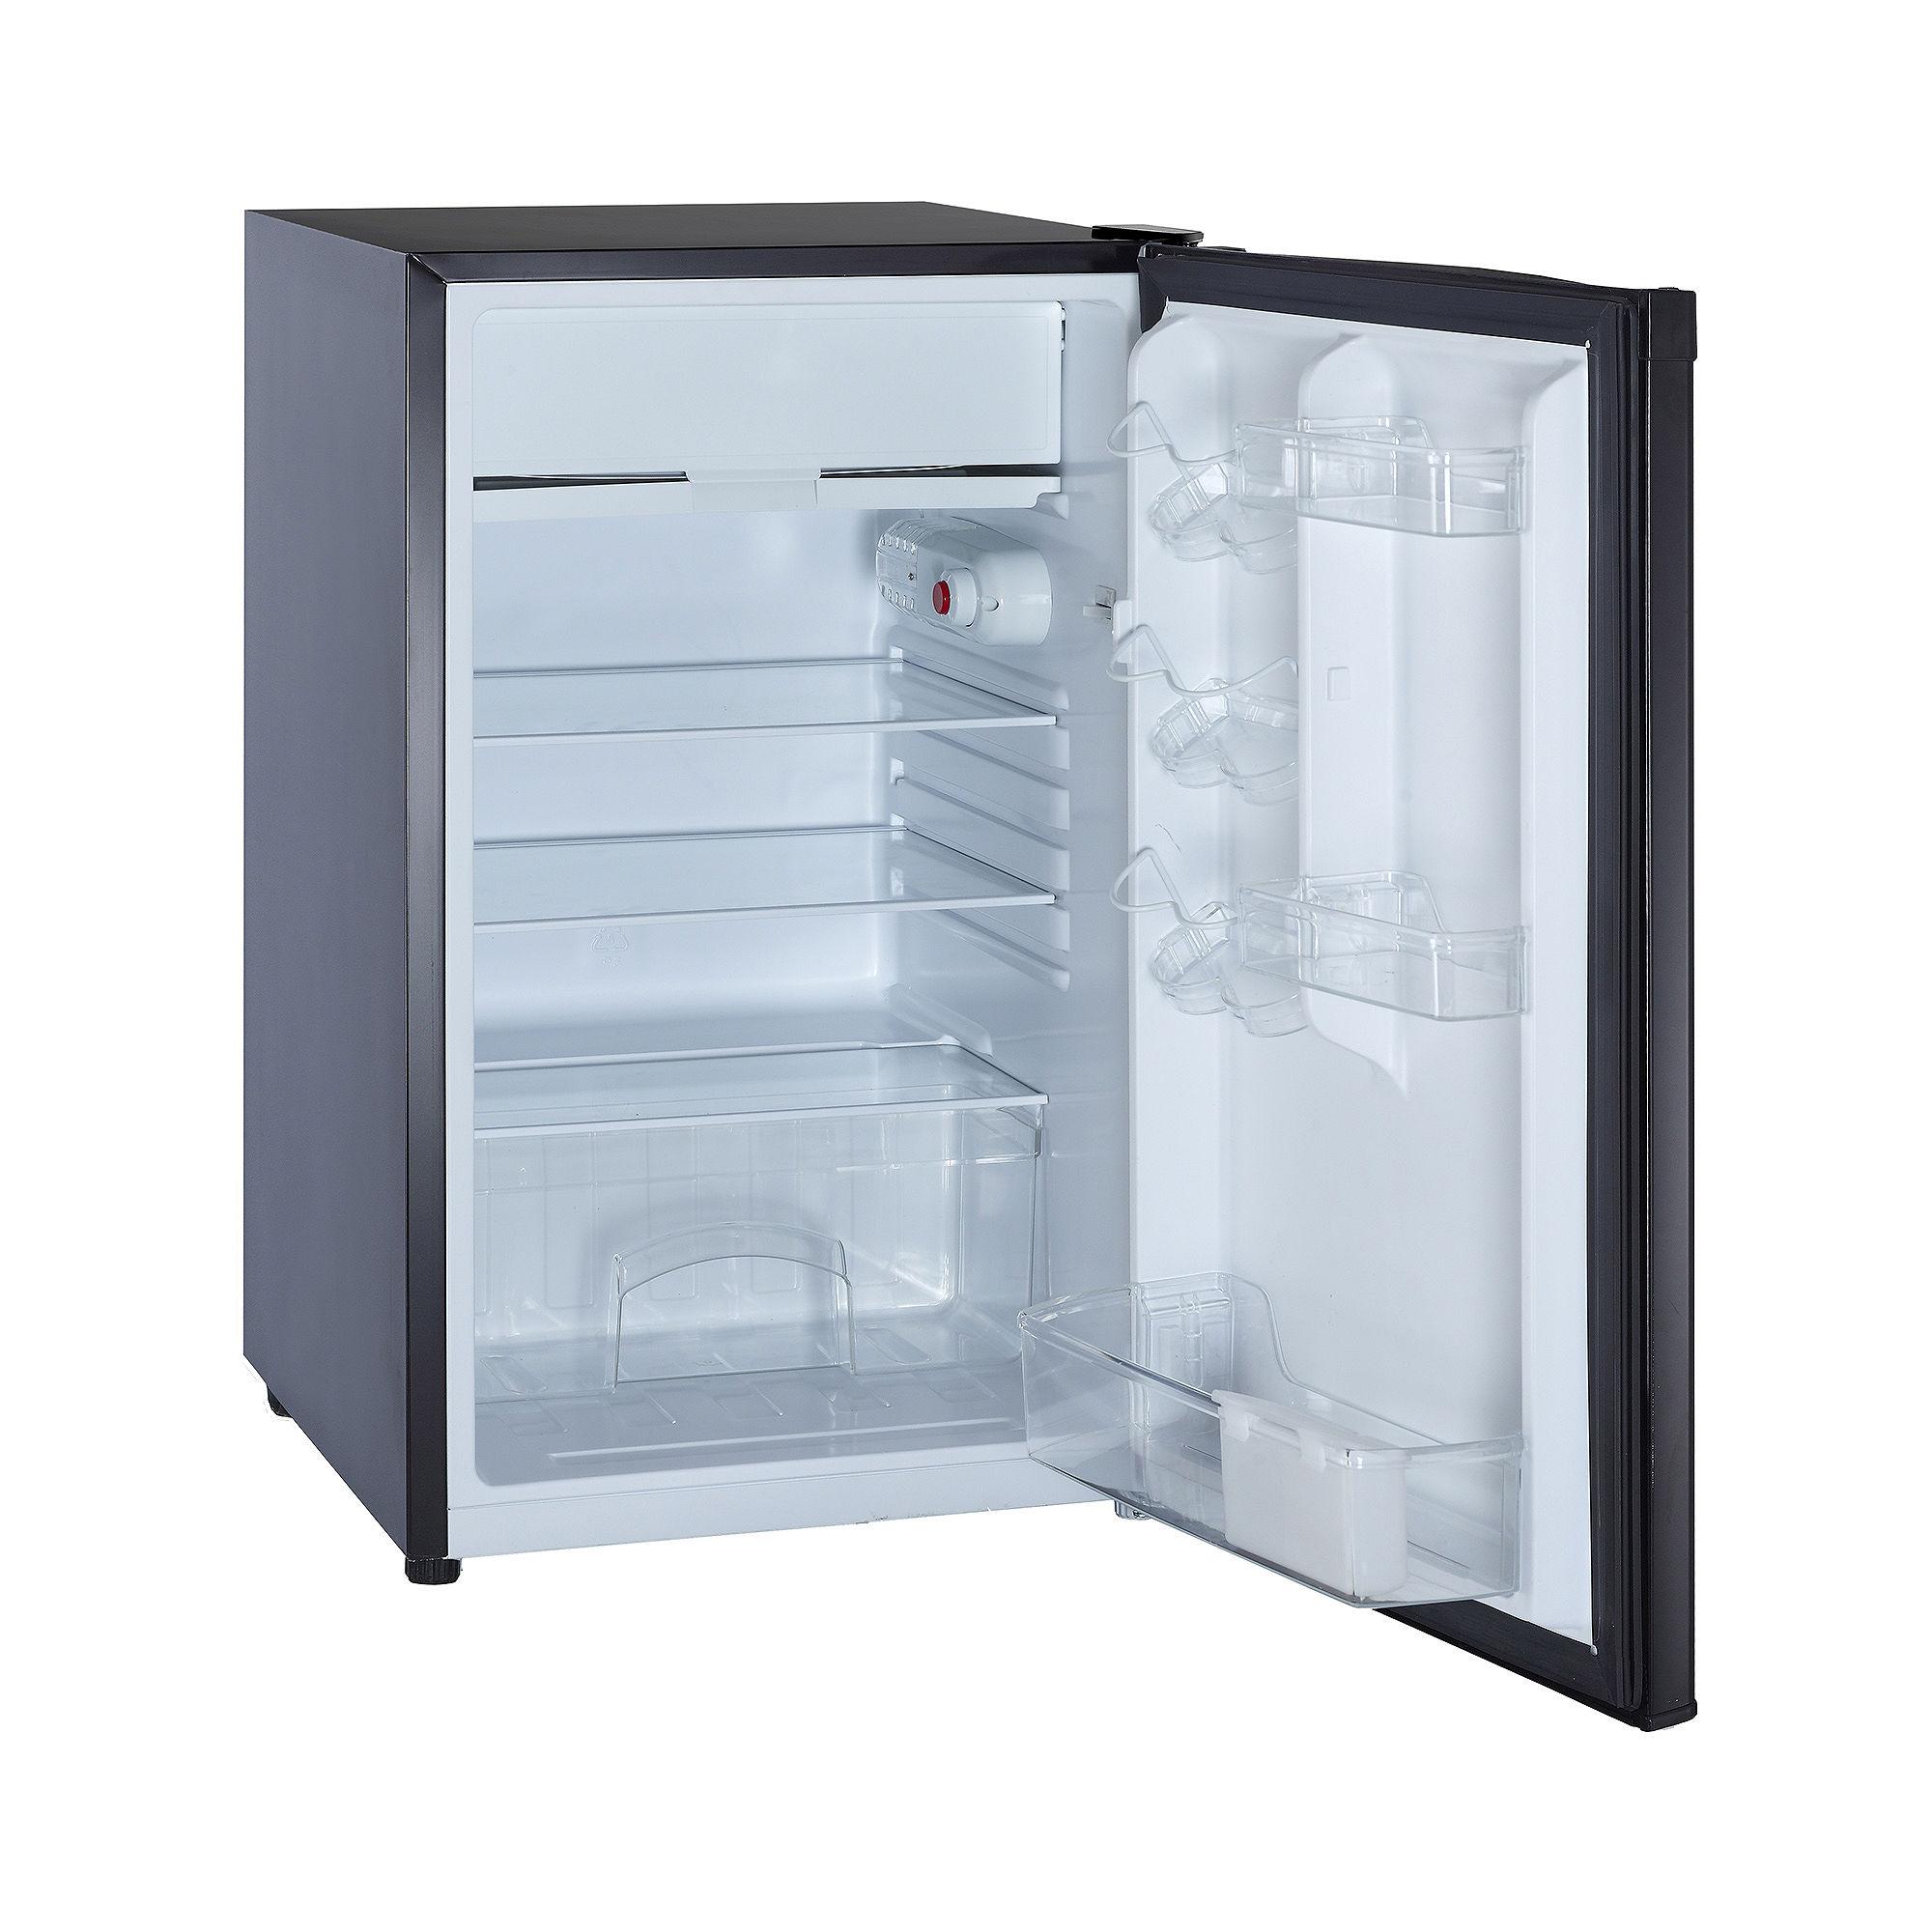 4.4 Compact Fridge with Freezer Black